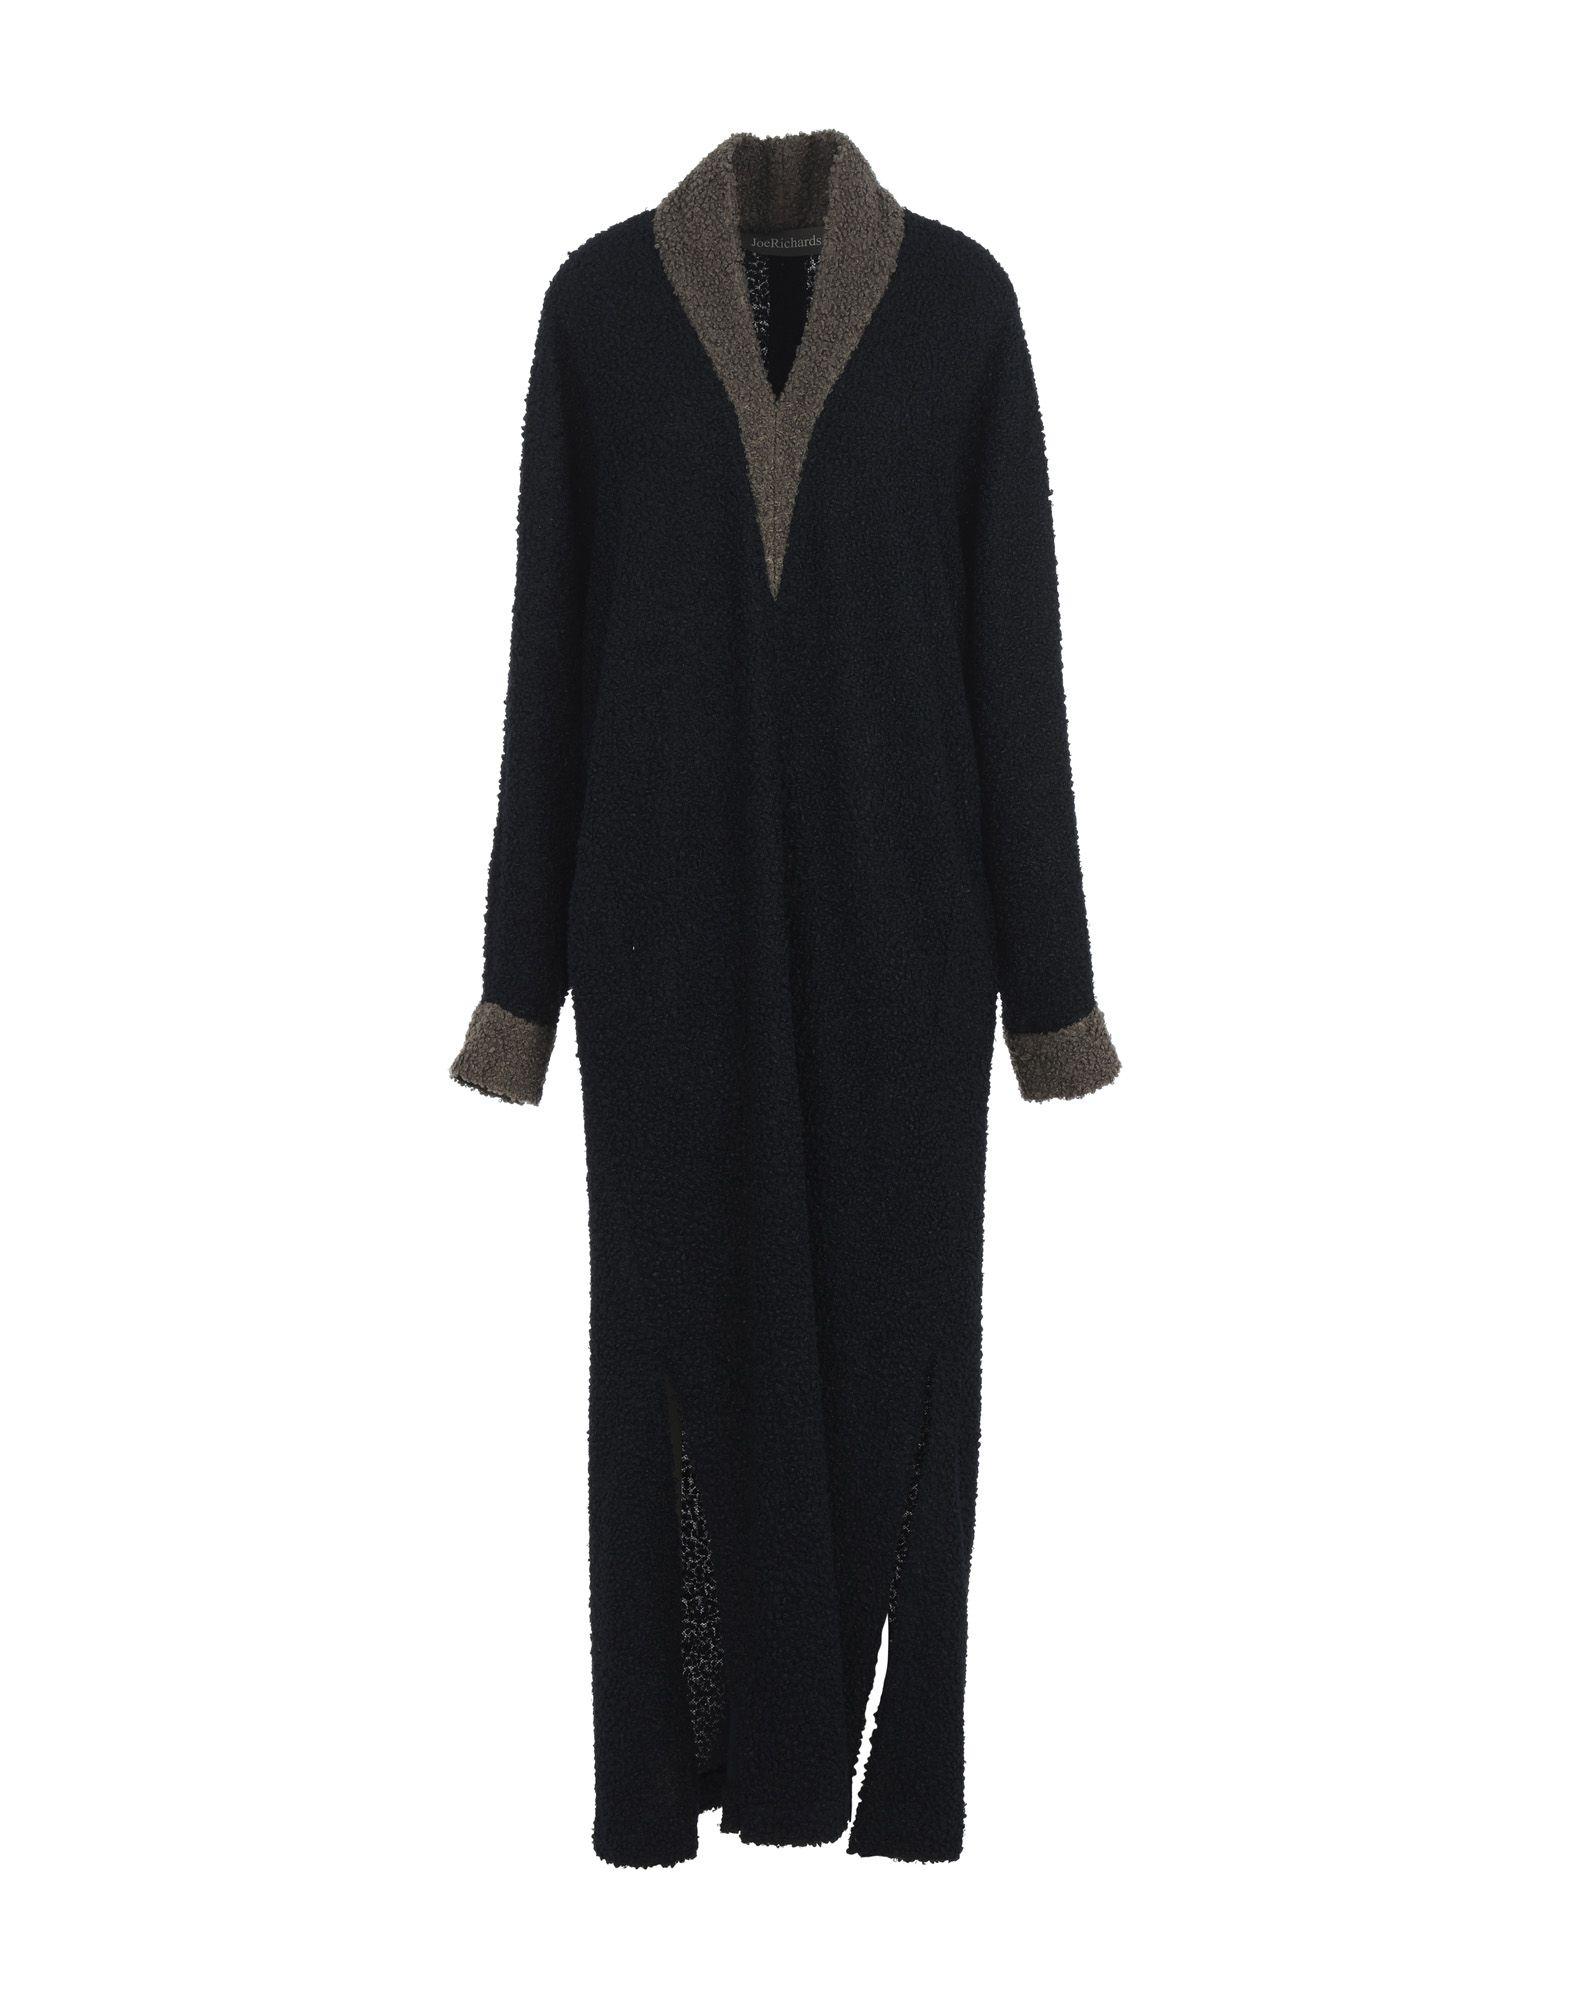 Vestito Lungo Joe Richards Donna - Acquista online su aoabHAXQdm